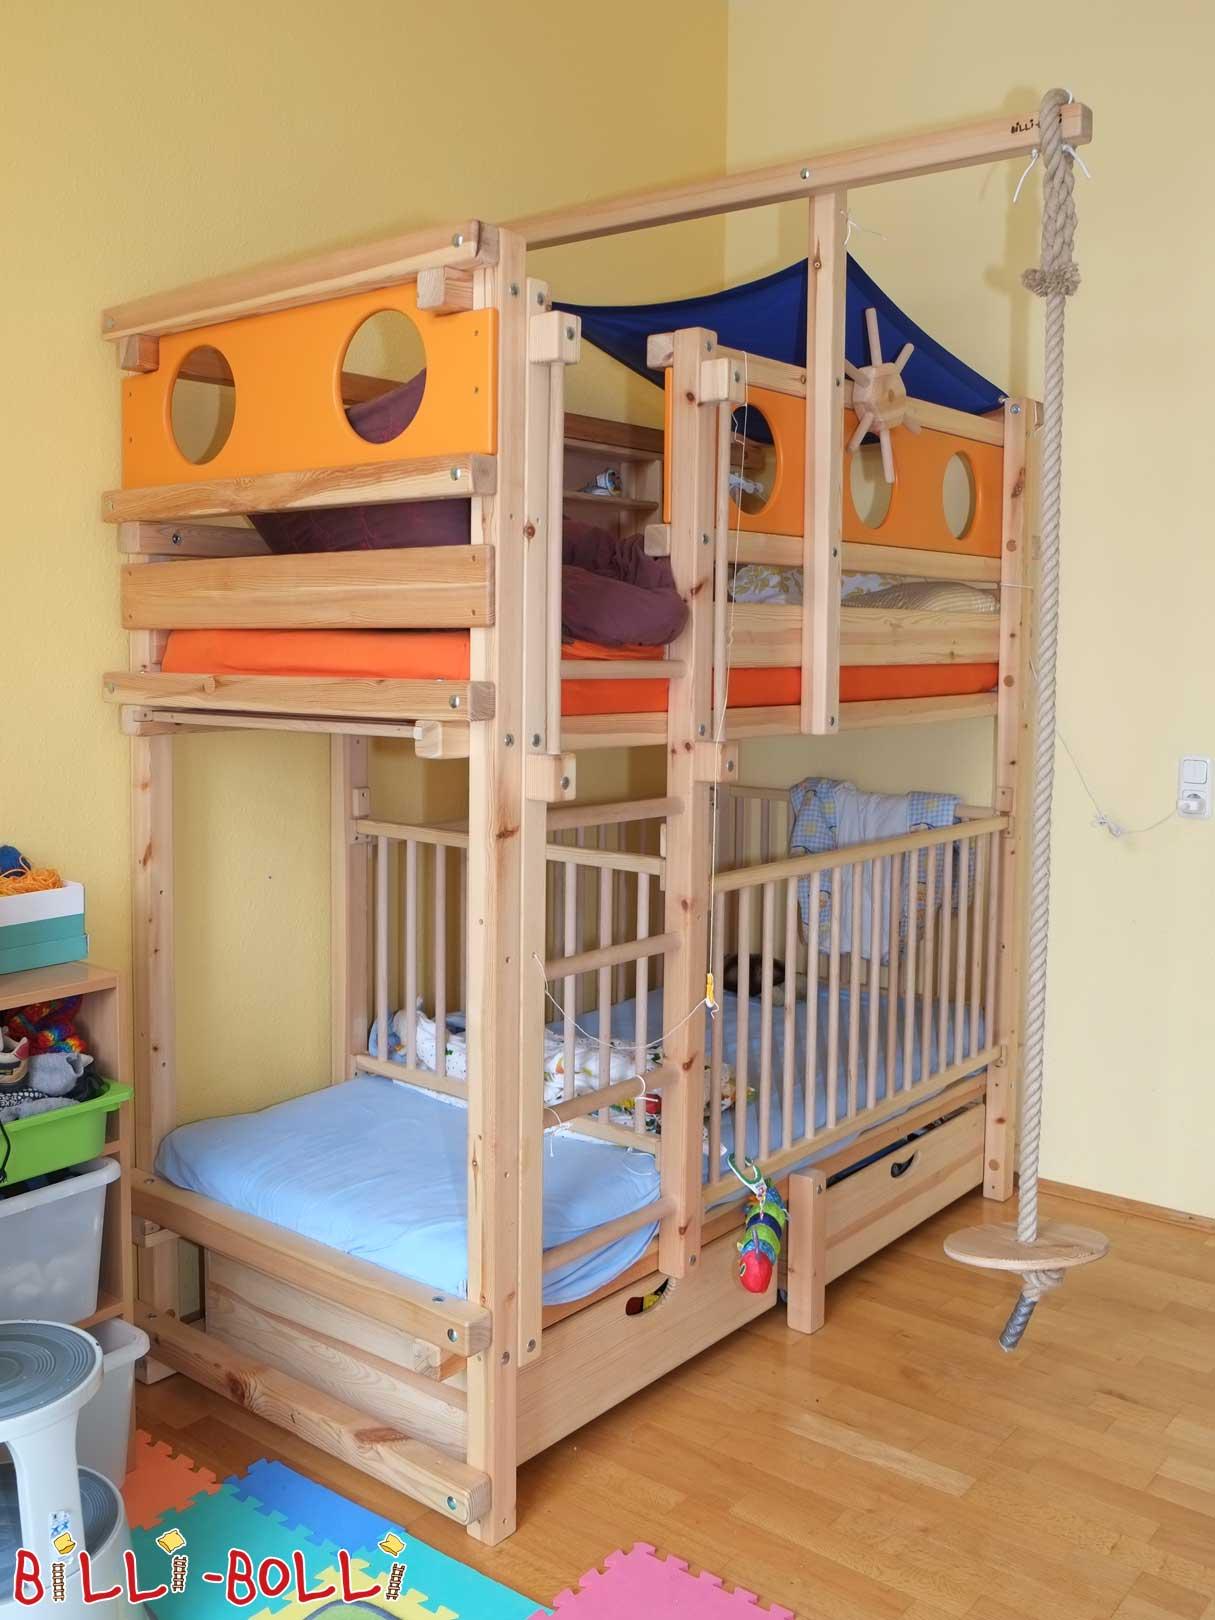 Baby bed gates - Baby Gates Image 6